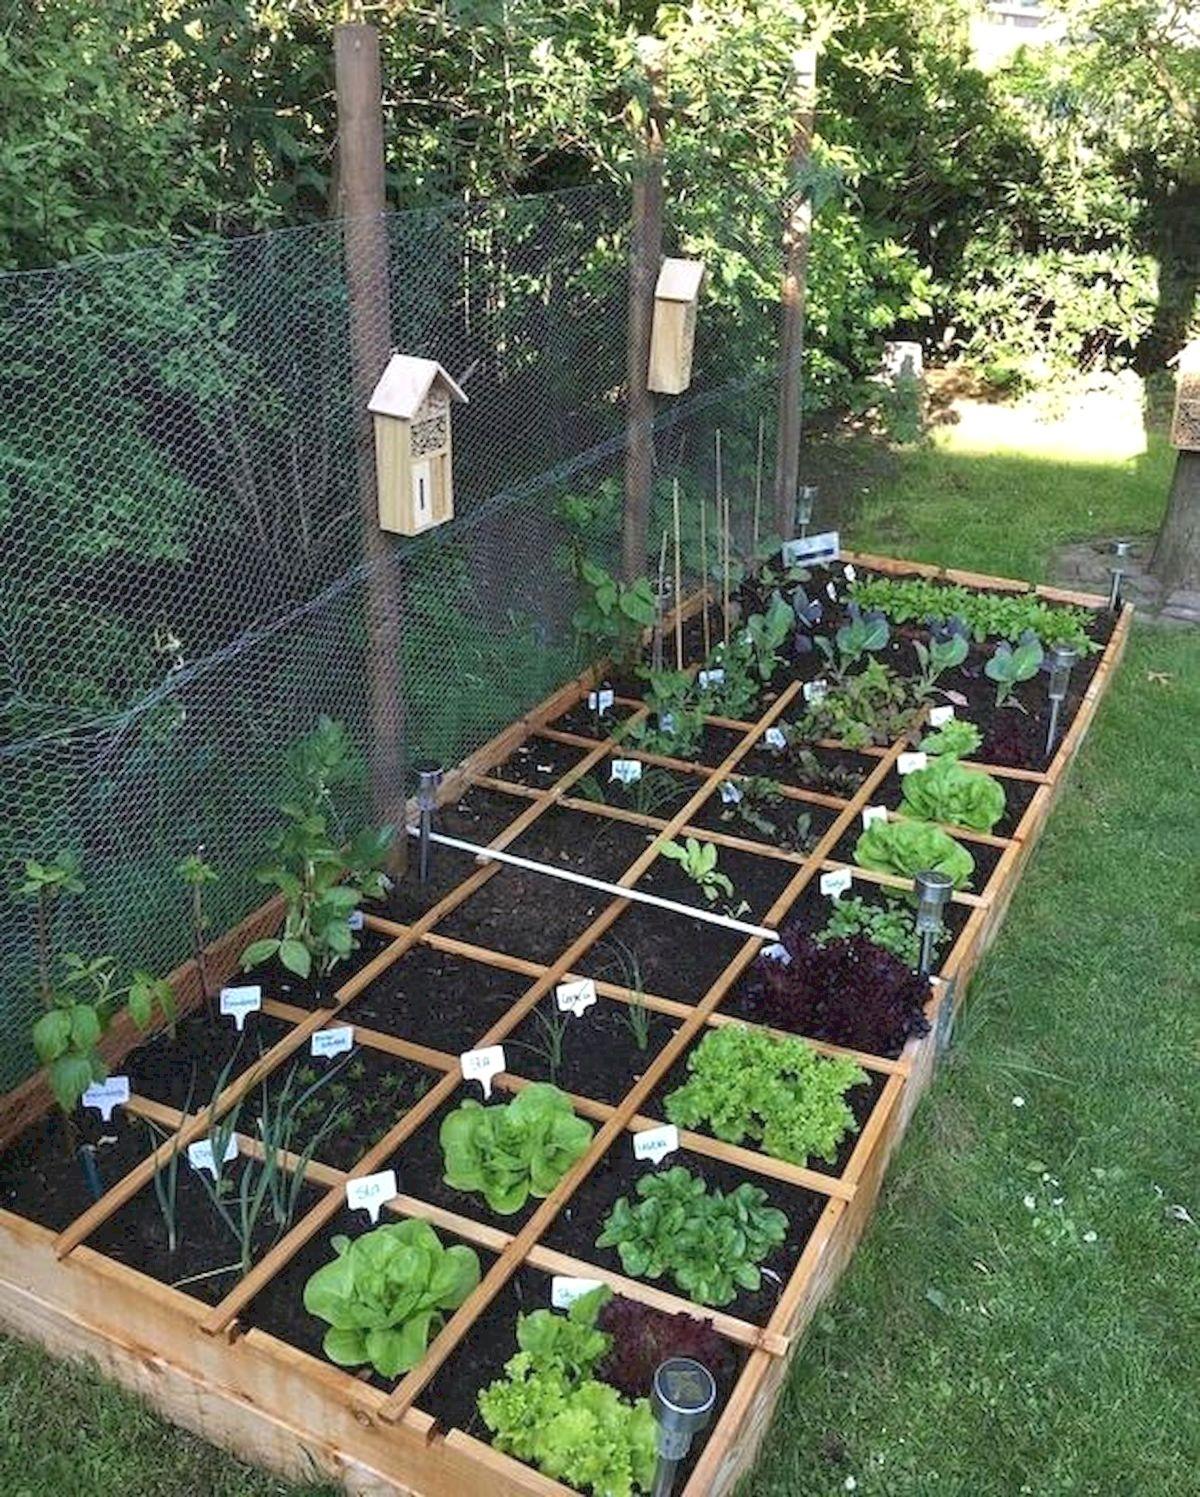 5 Vertical Vegetable Garden Ideas For Beginners: Advantages Of Planting Vegetable Gardens